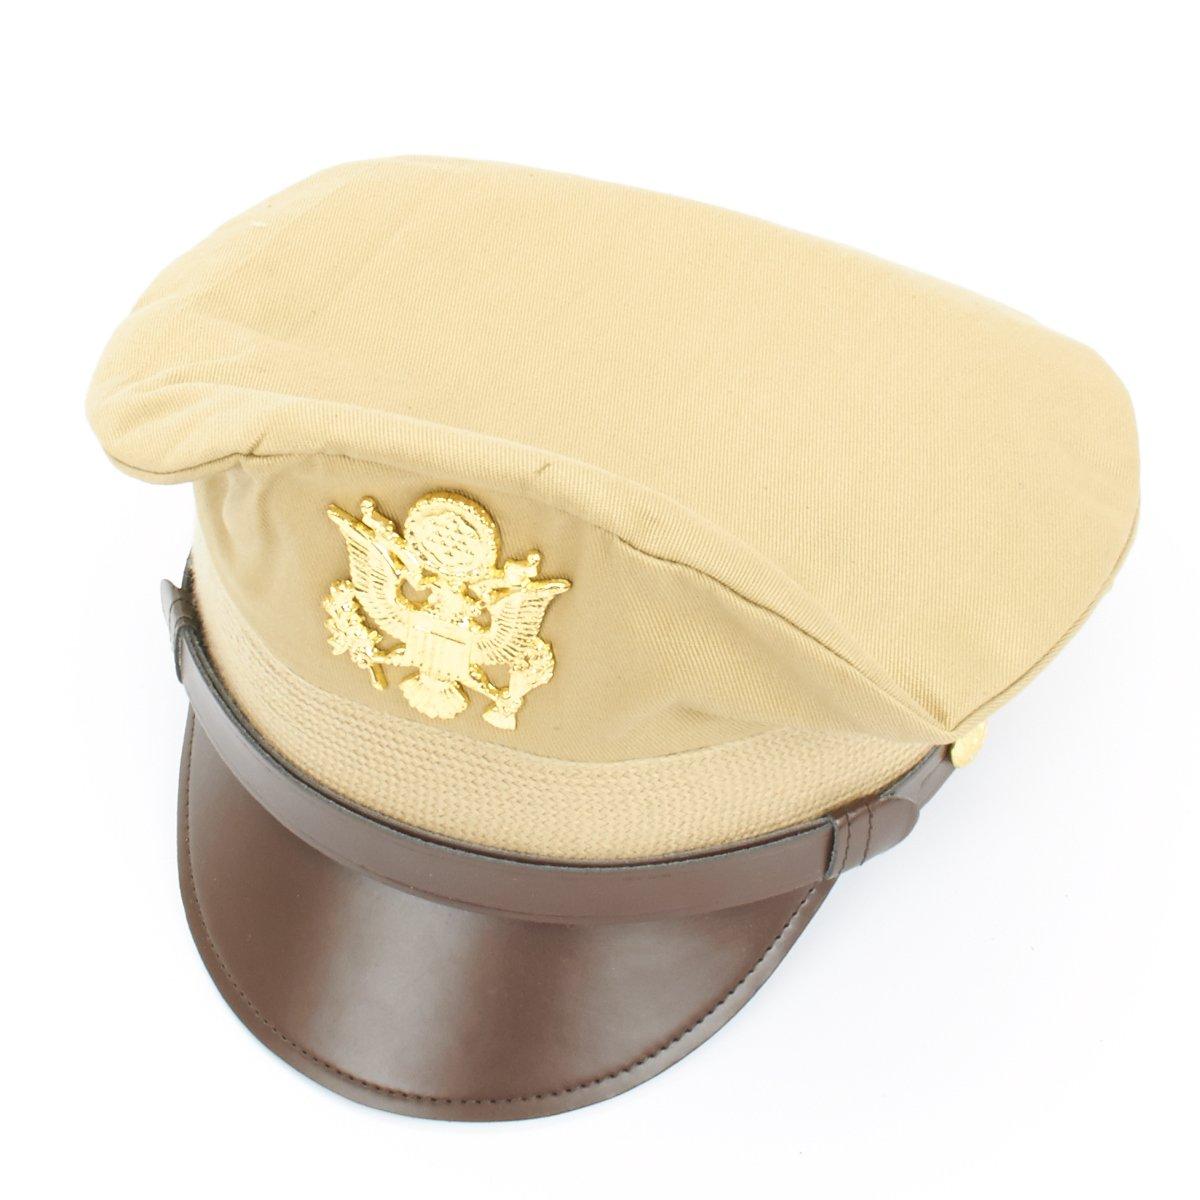 c6ed0e27c11c44 Amazon.com: U.S. WWII Officer Visor Crusher Cap: Summer (Khaki) - Size US 7  1/2 (60 cm): Military Apparel Accessories: Clothing